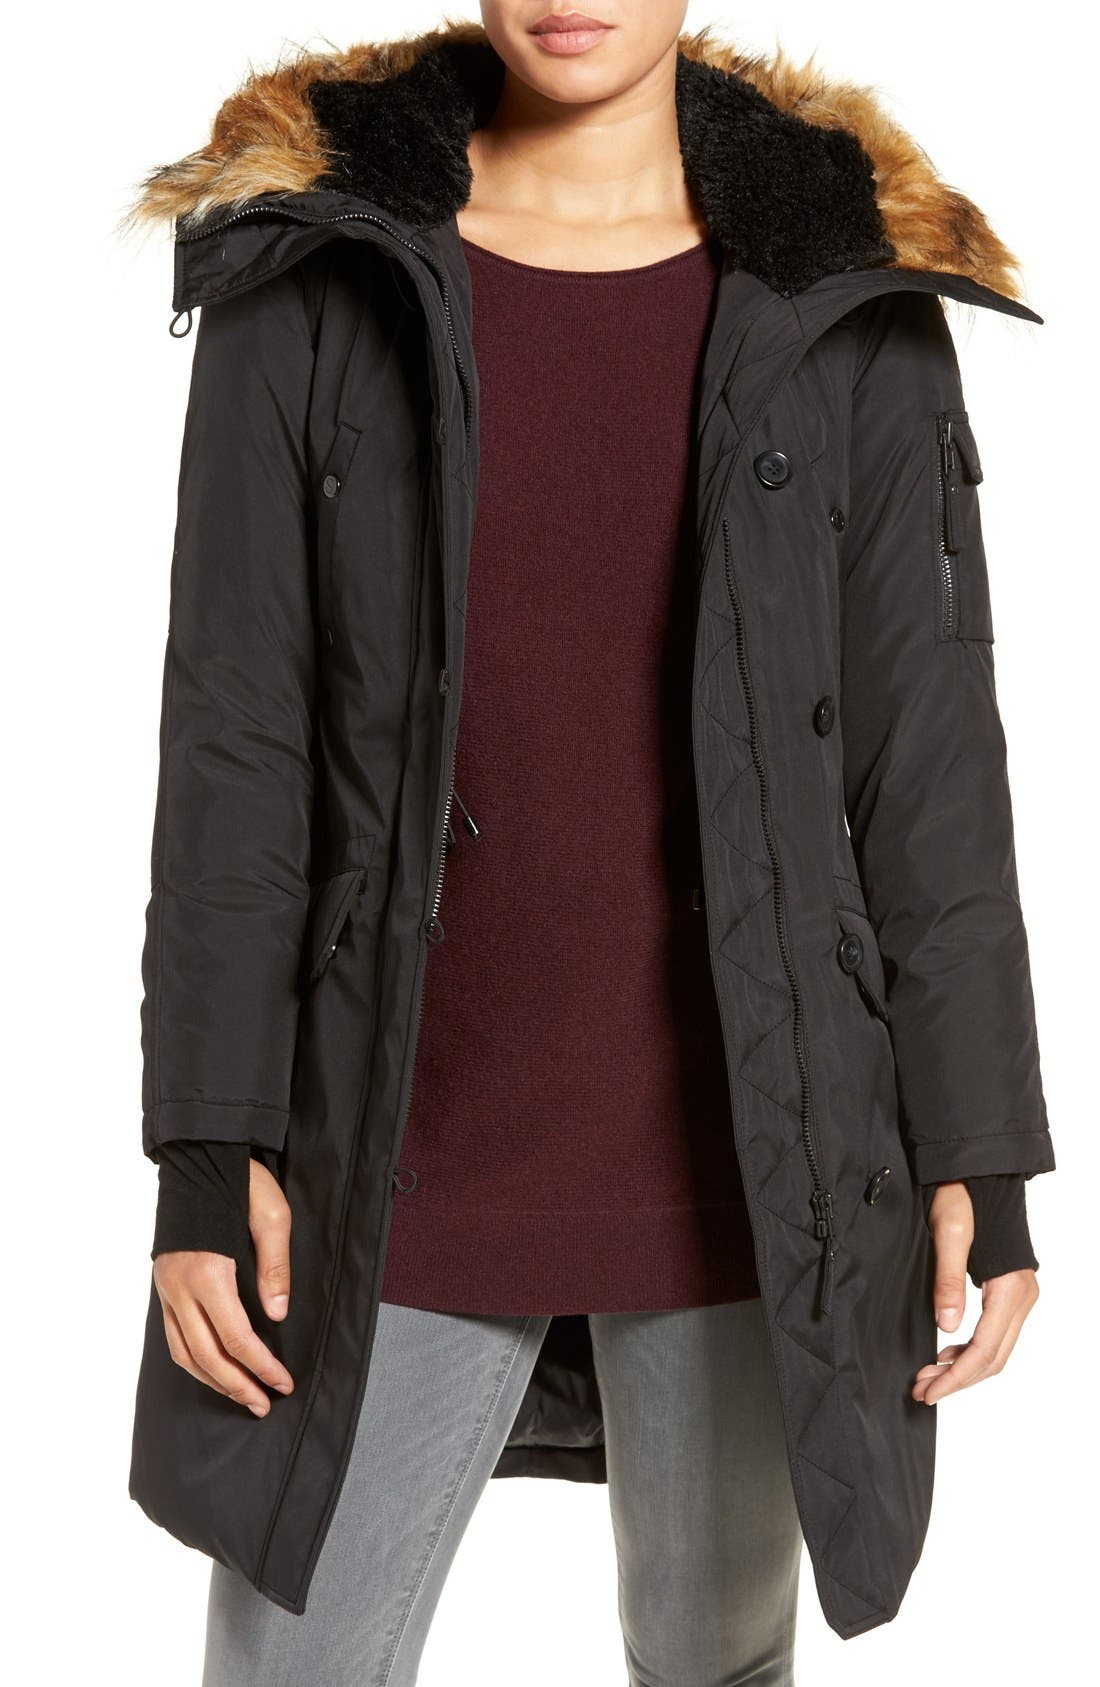 Main Image - S13 'Alaska' Parka with Faux Fur Trim Hood